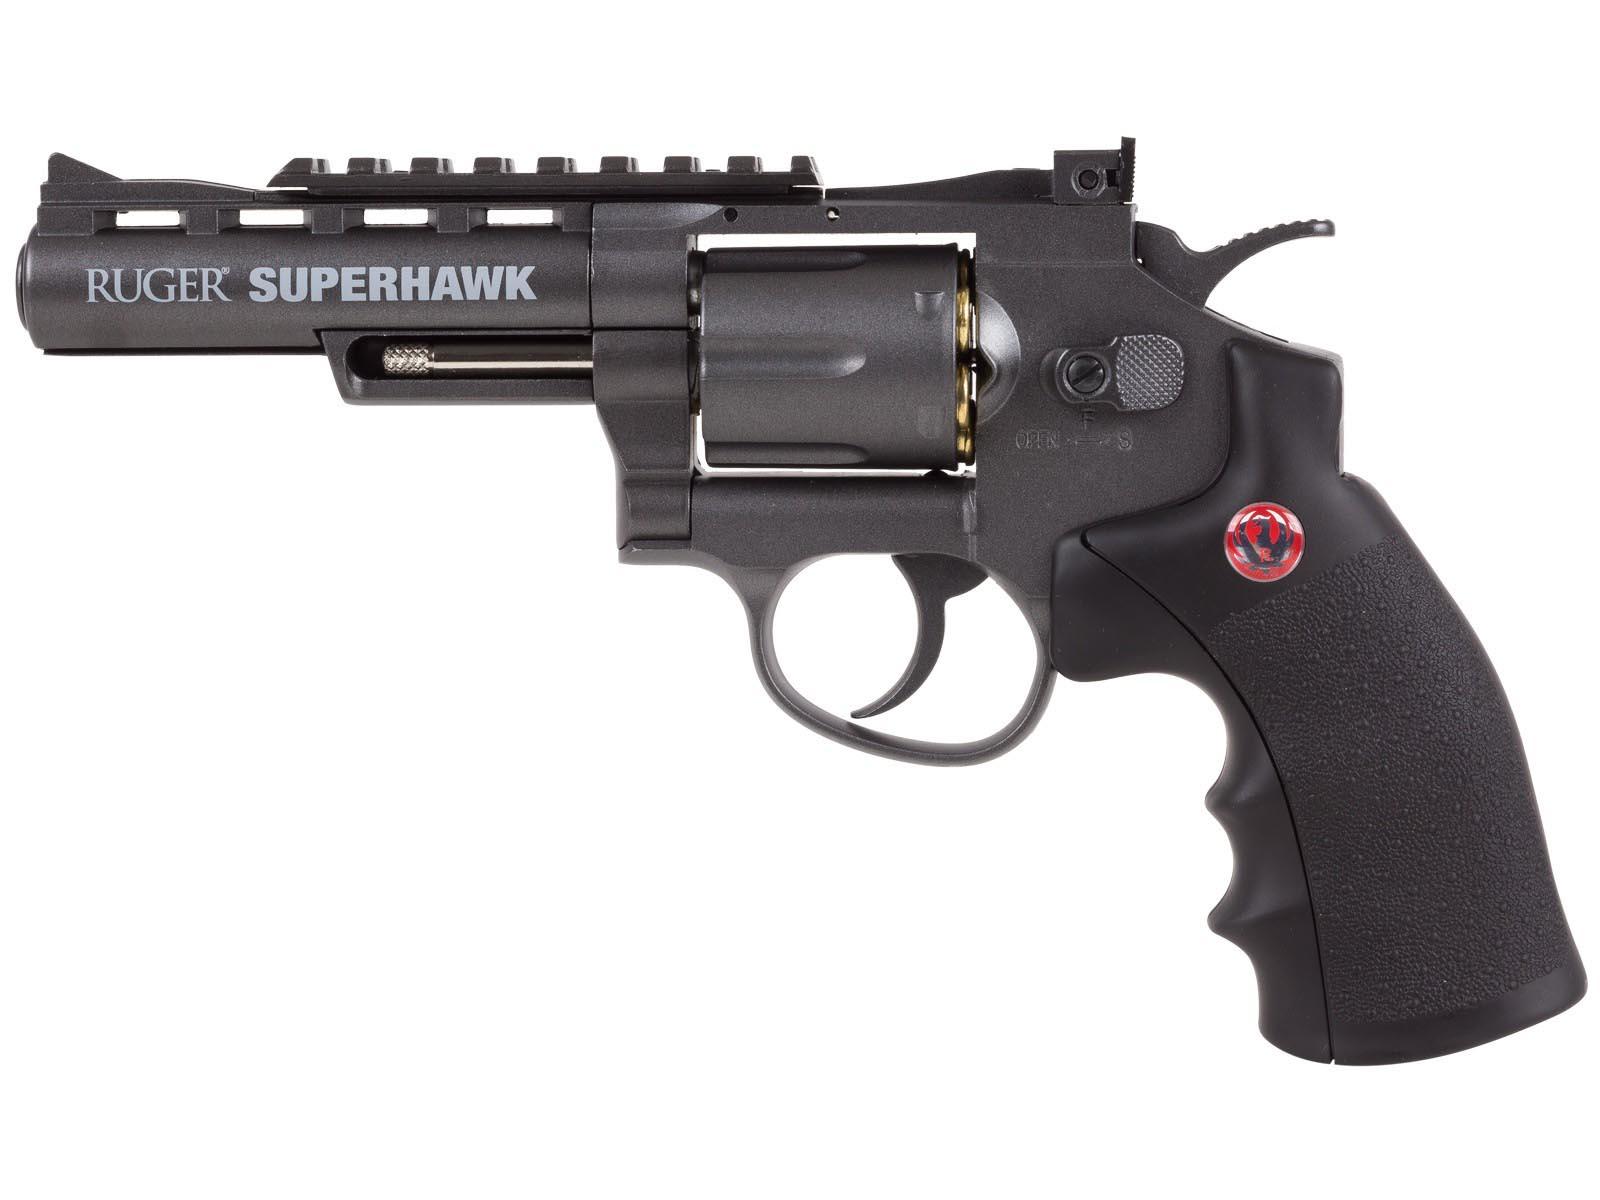 Ruger Superhawk BB Revolver